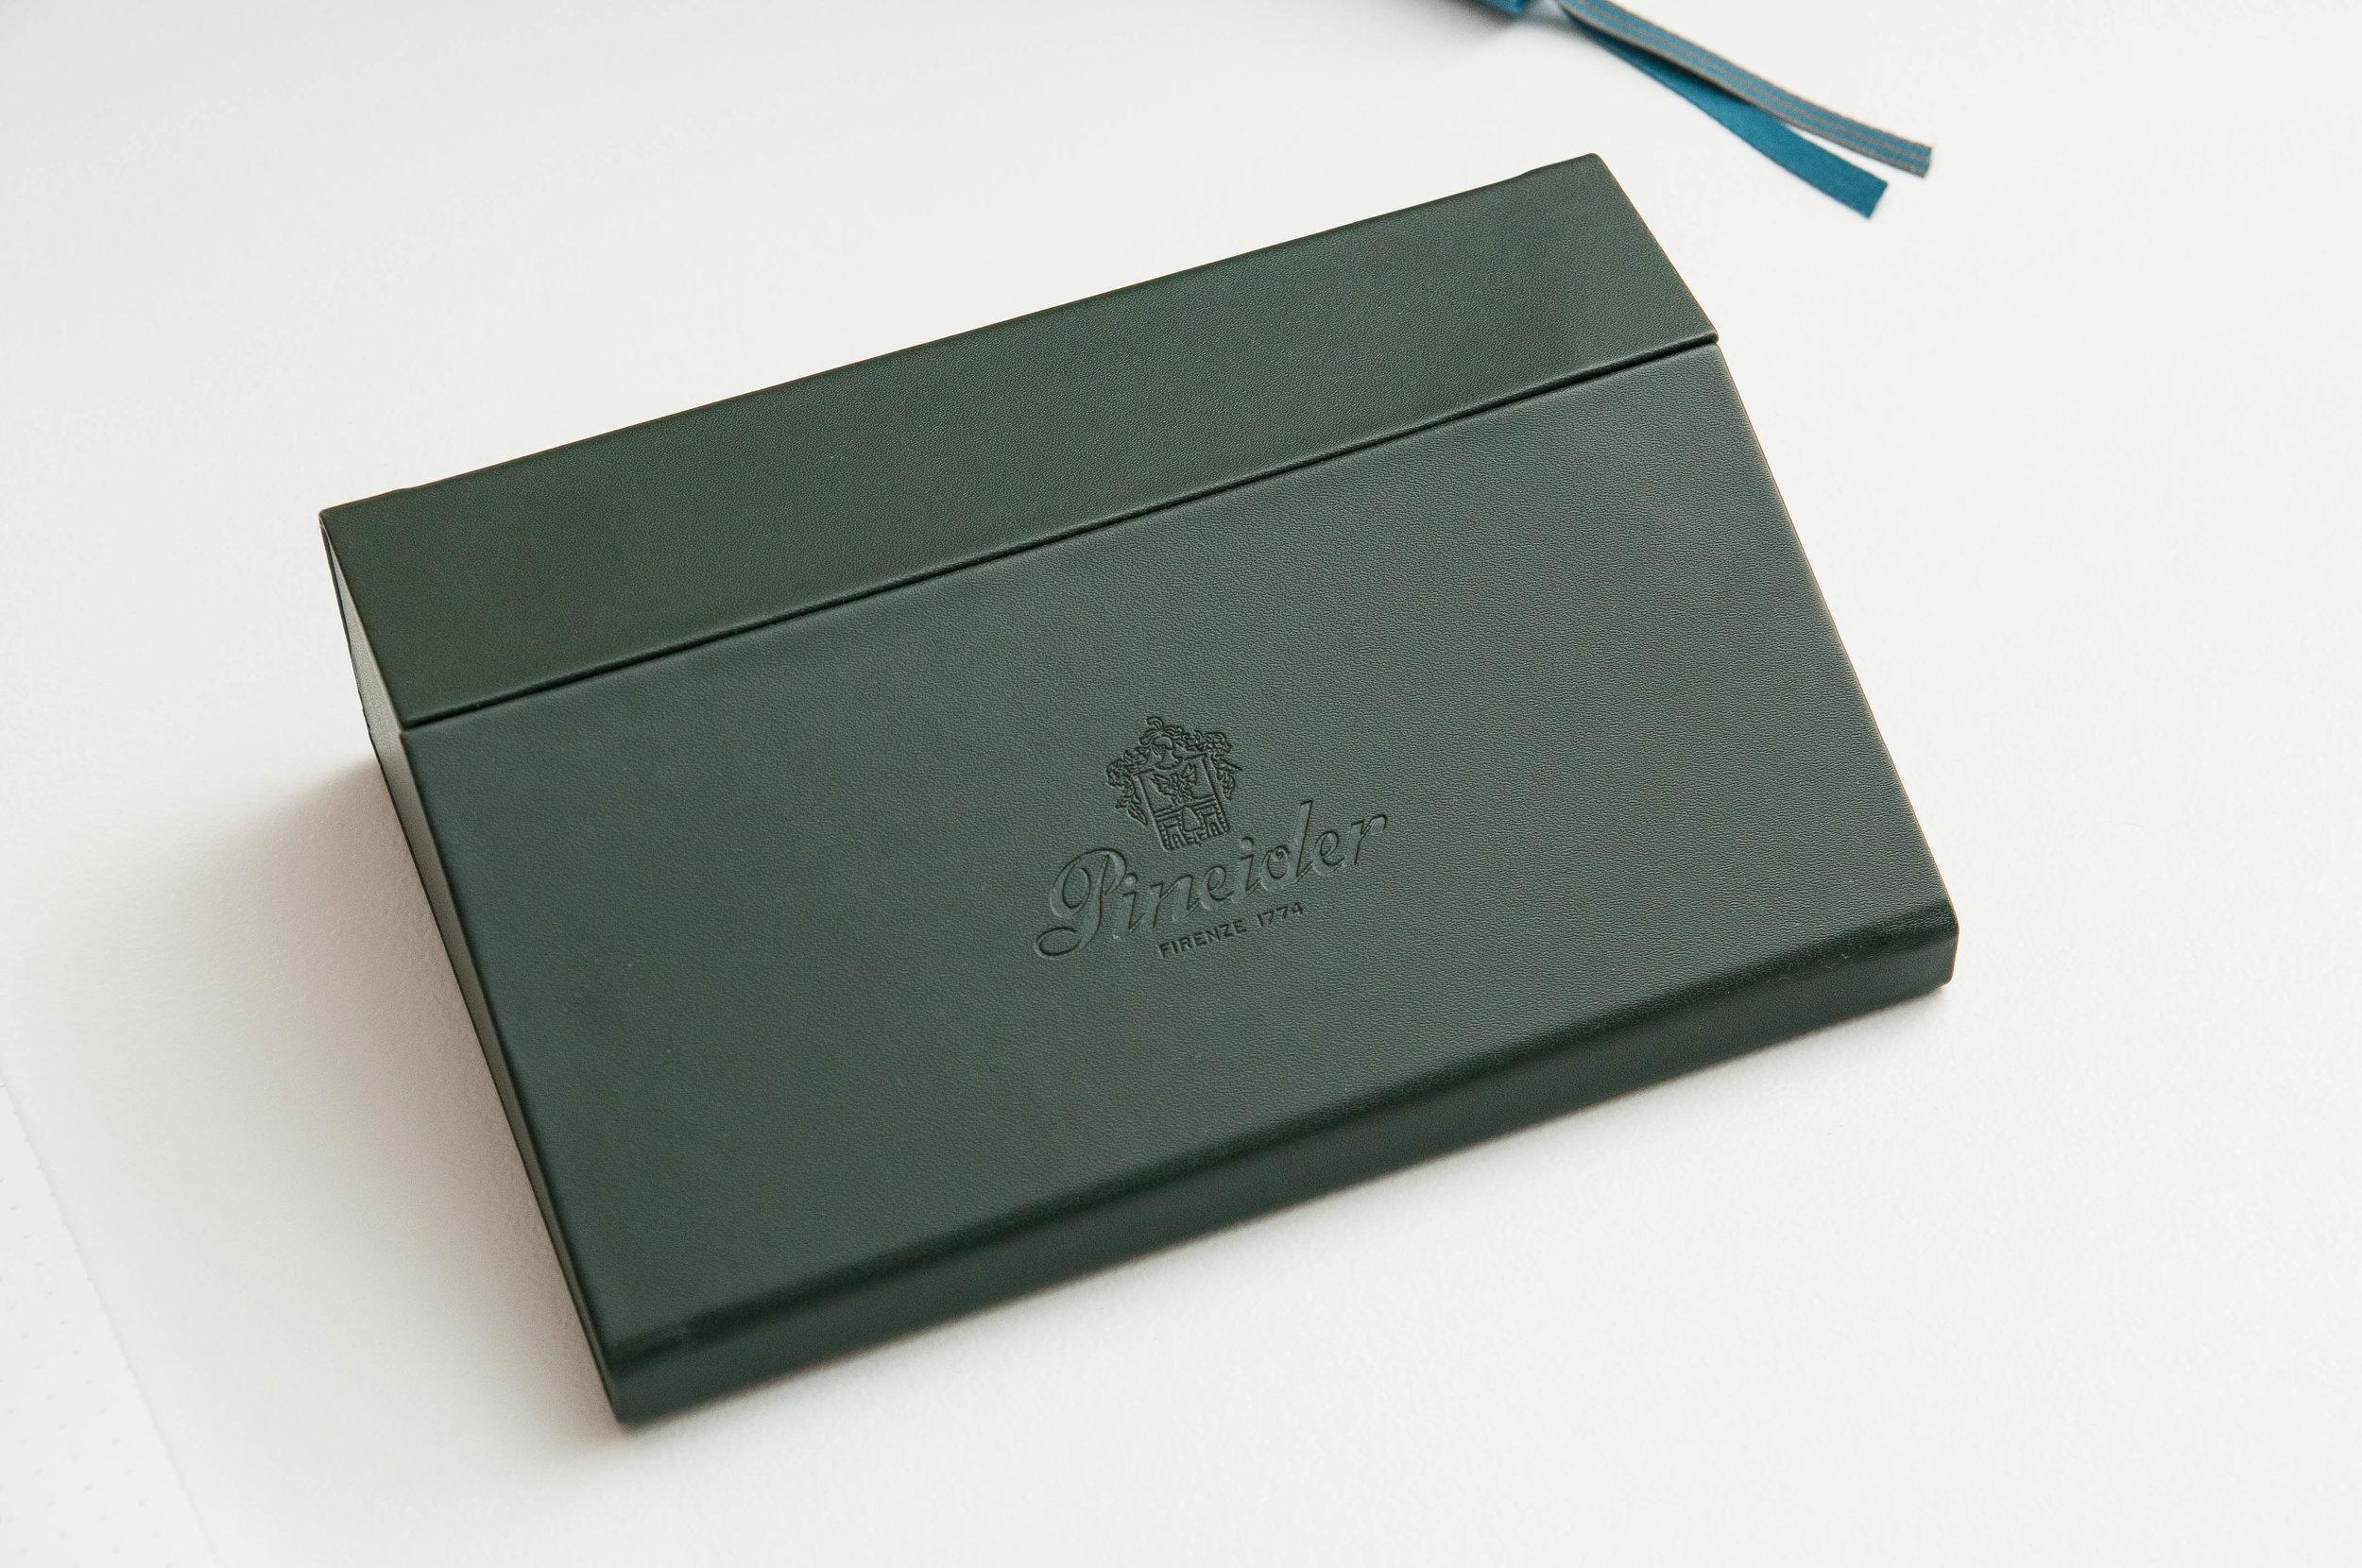 Pineider Avatar Fountain Pen Box